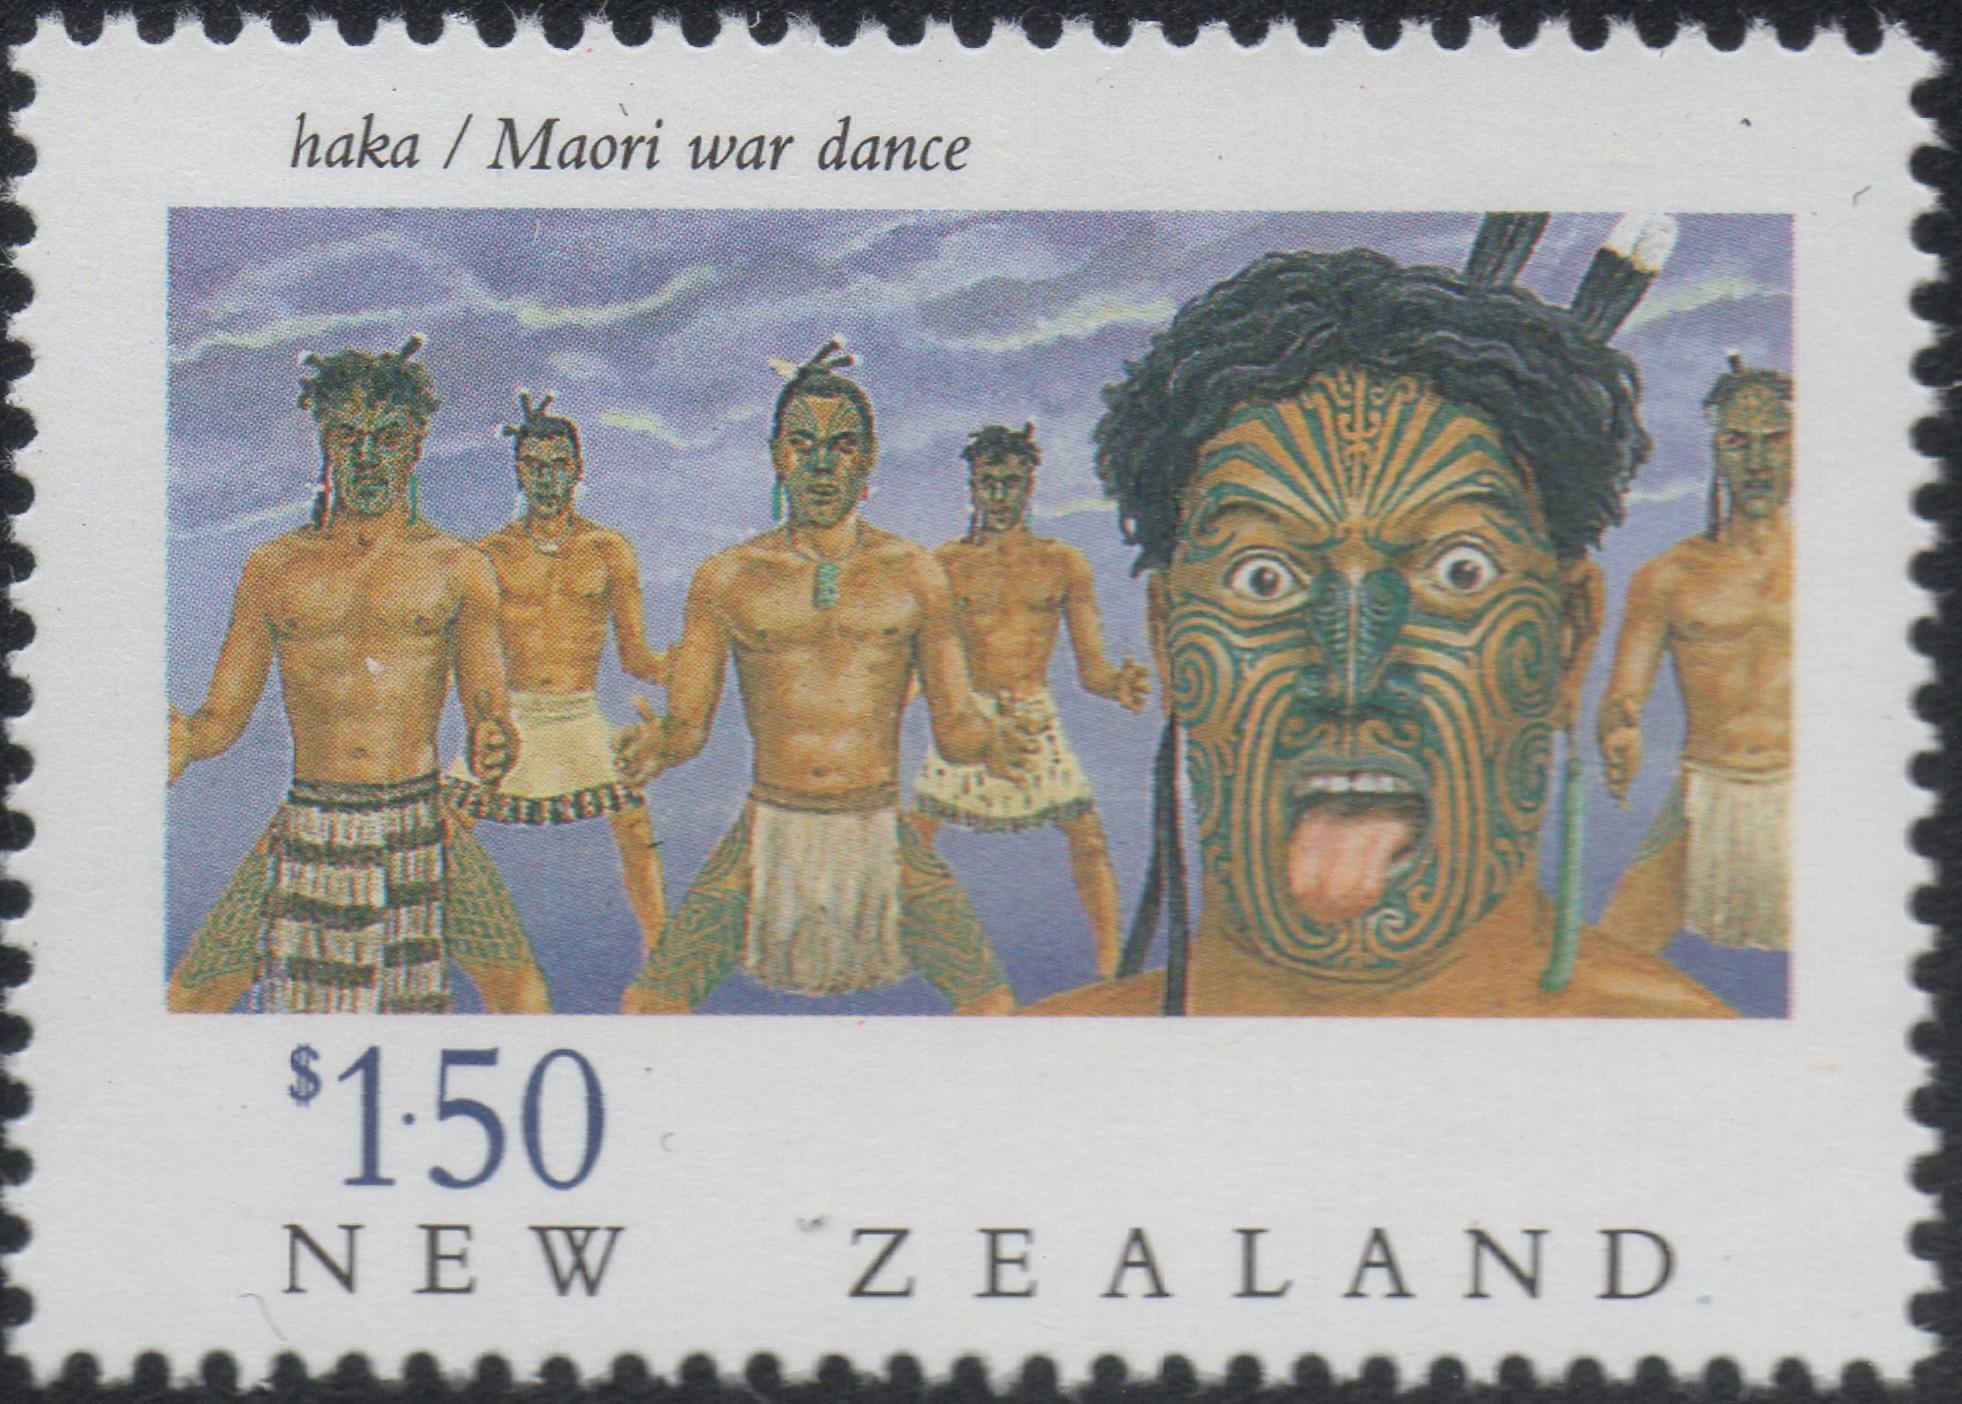 New Zealand - Scott #1002 (1990)